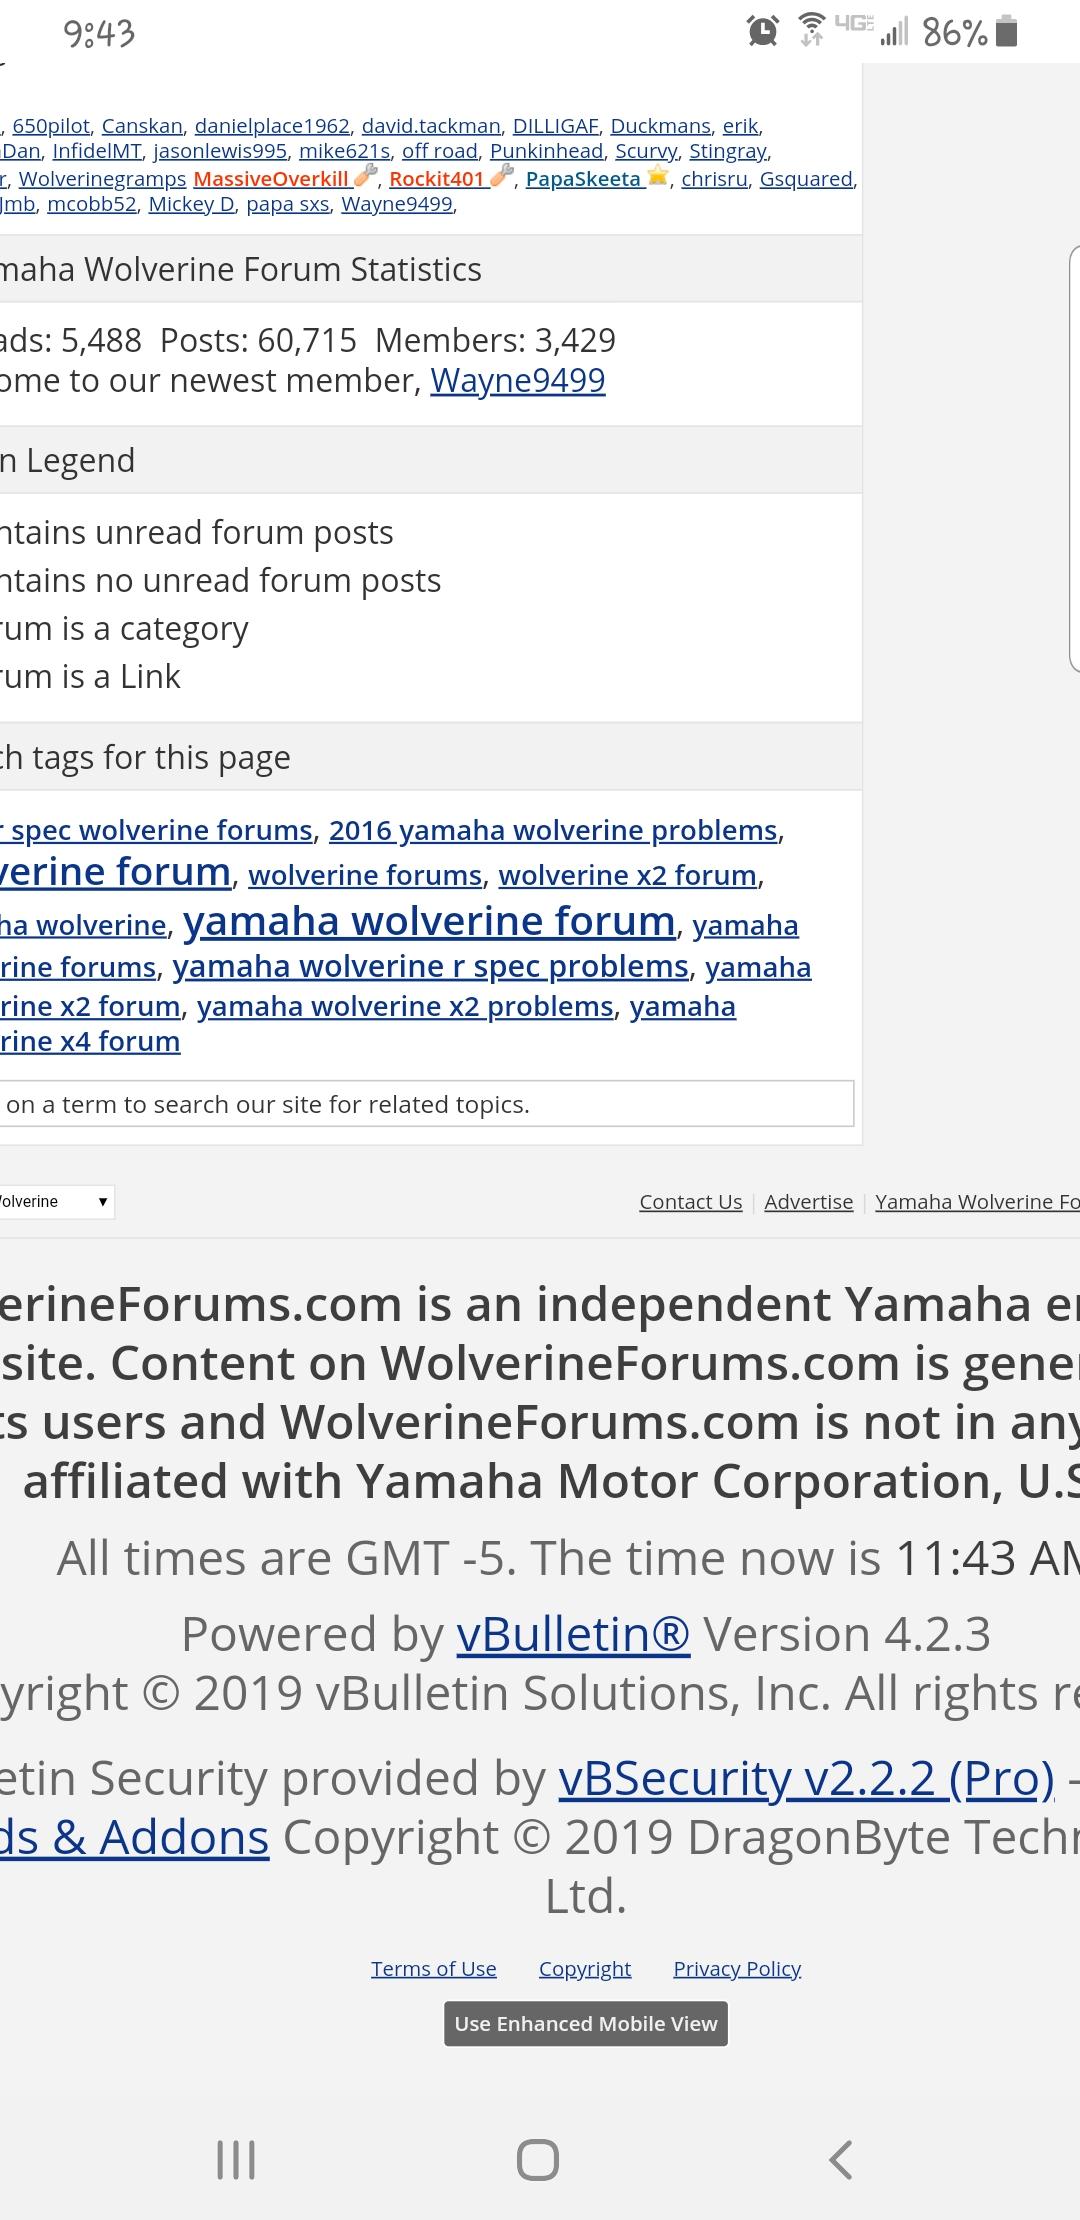 Name:  Screenshot_20191119-094328_Chrome_1574181858864.jpg Views: 36 Size:  626.7 KB